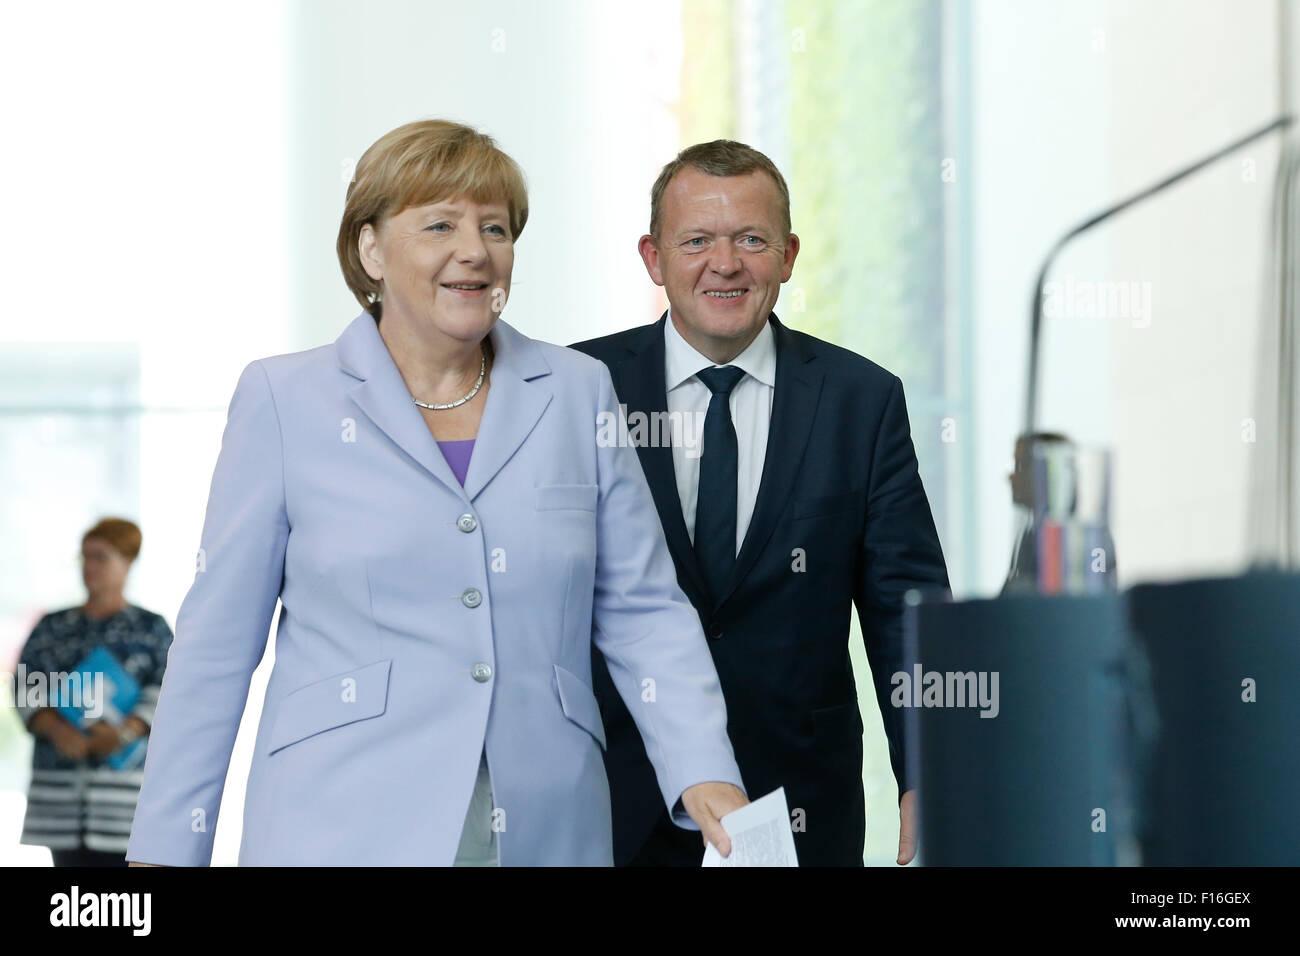 Berlin, Germany. 28th August, 2015. German Chancellor Angela Merkel and Lars Løkke Rasmussen, Prime Minister of Stock Photo